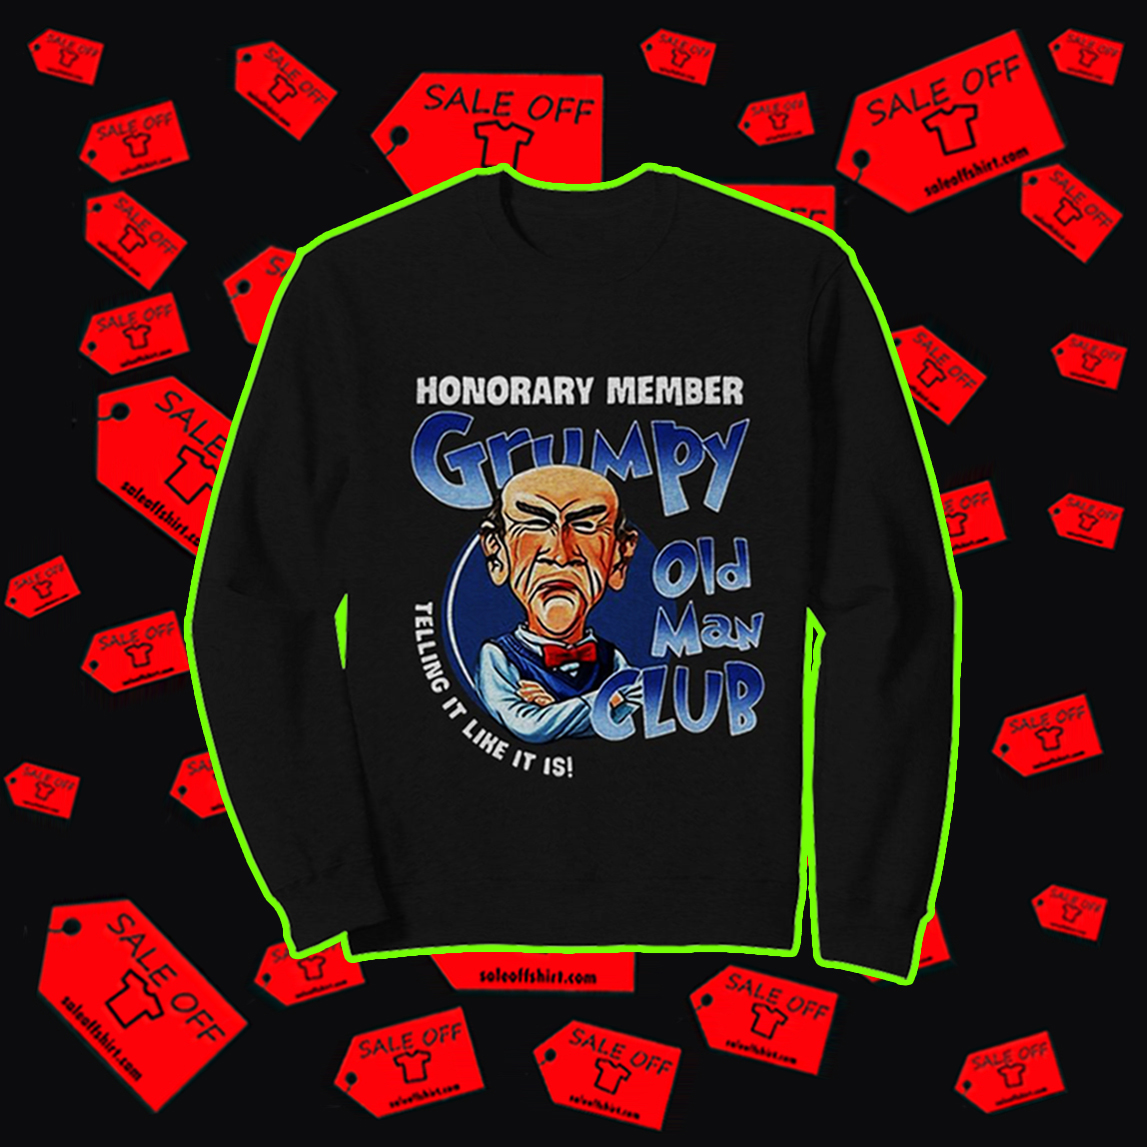 ® Where to buy: Walter honorary member grumpy old man club shirt